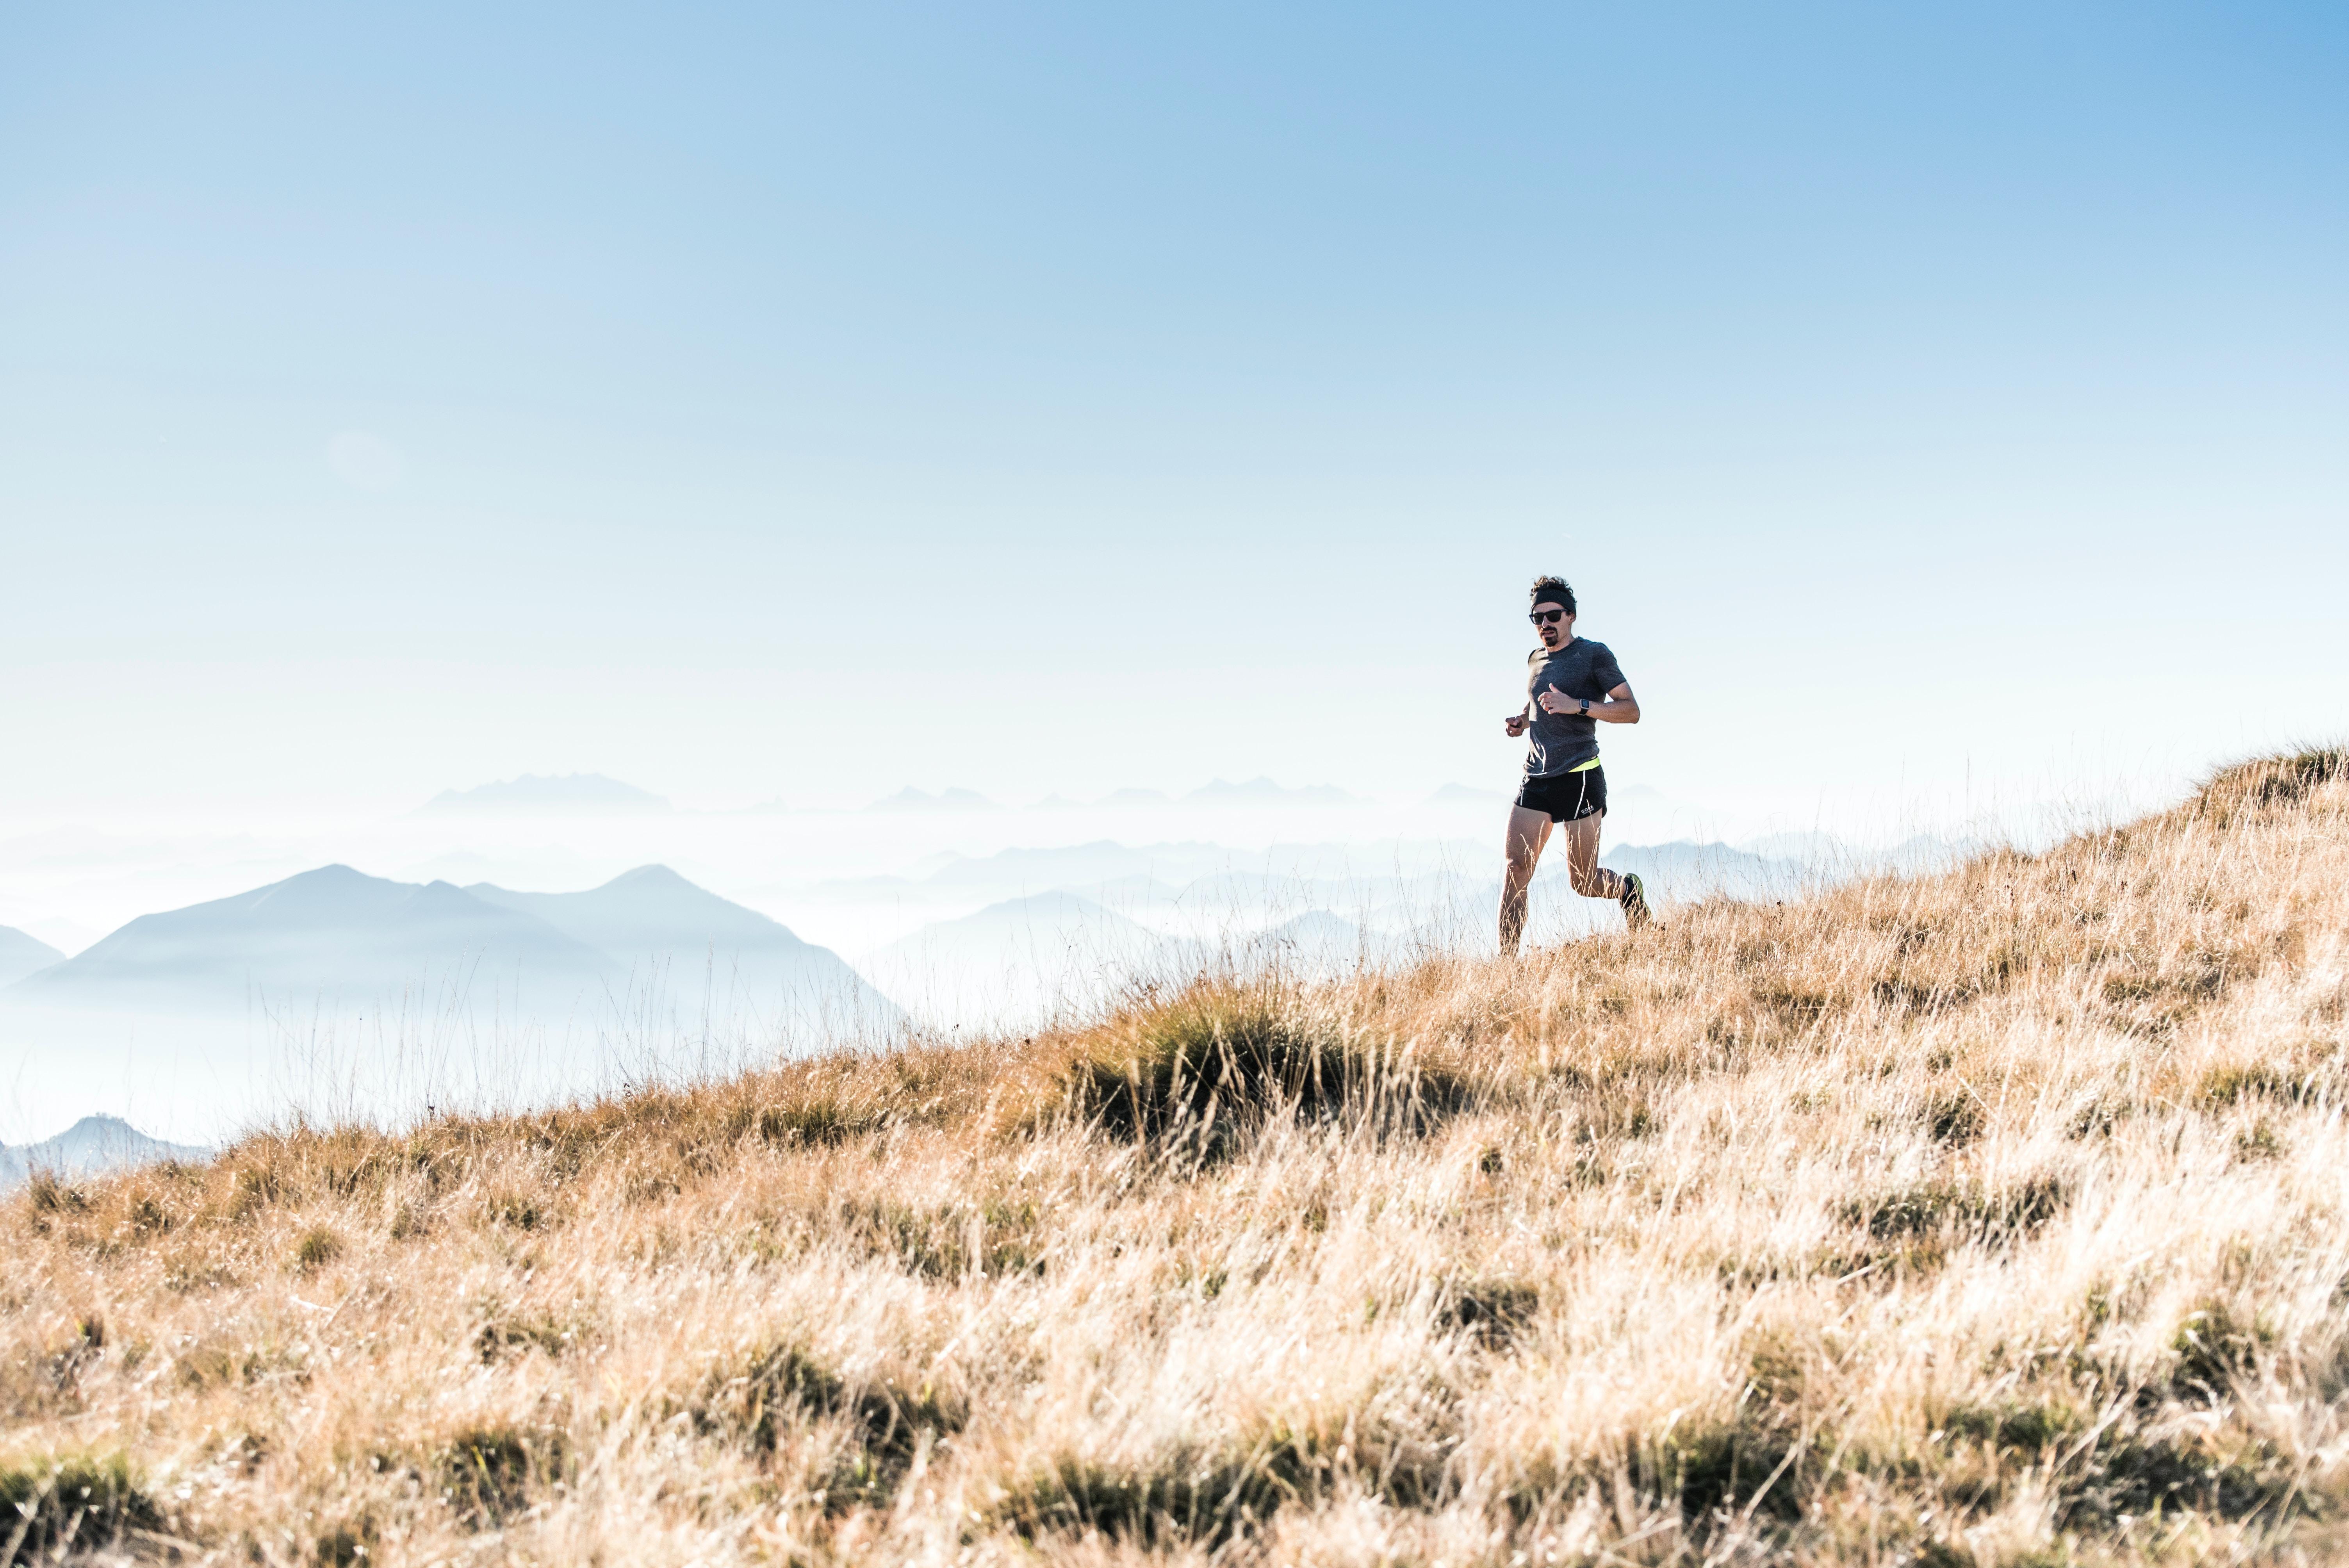 trail runner running on the mountain